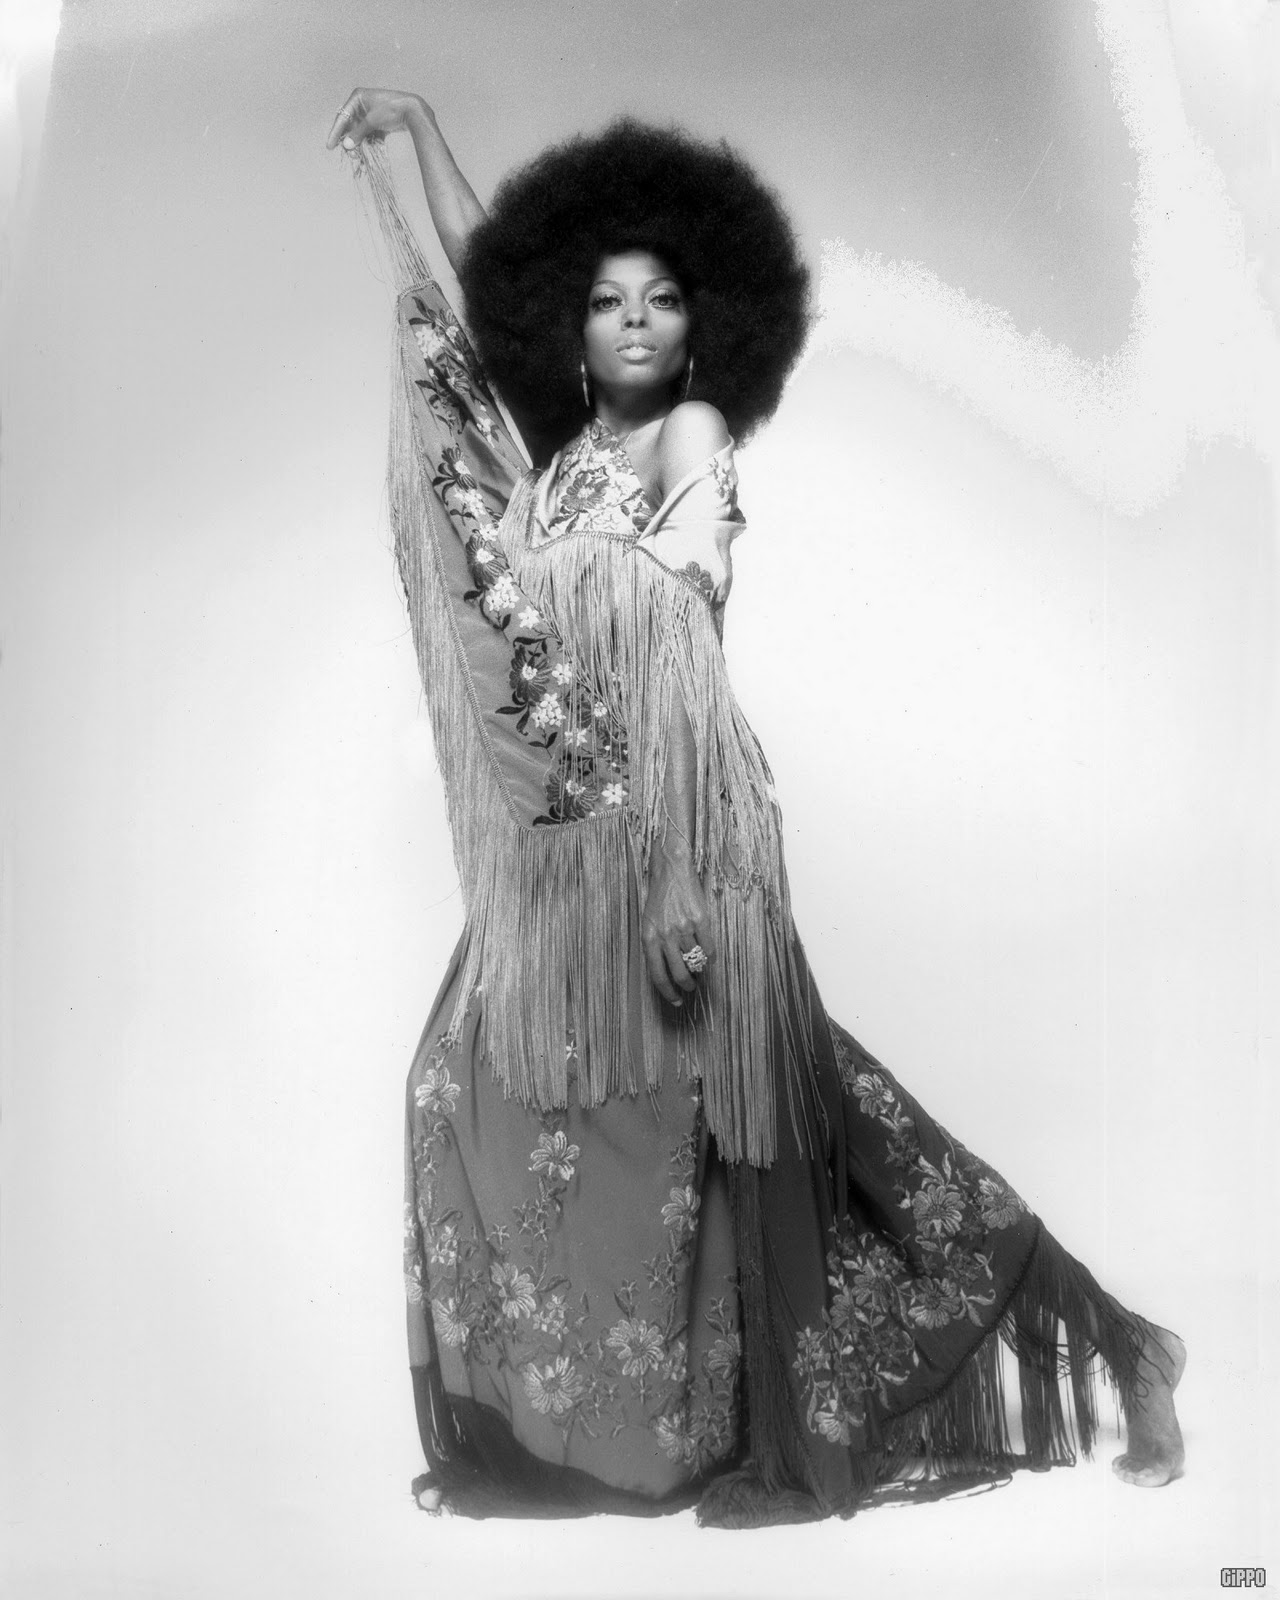 http://3.bp.blogspot.com/_XEBXGKgq3oc/TPl2fVI3kqI/AAAAAAAAALQ/DvP-XomIBAk/s1600/big-1968-diana-ross-hairstyle-afro.jpg